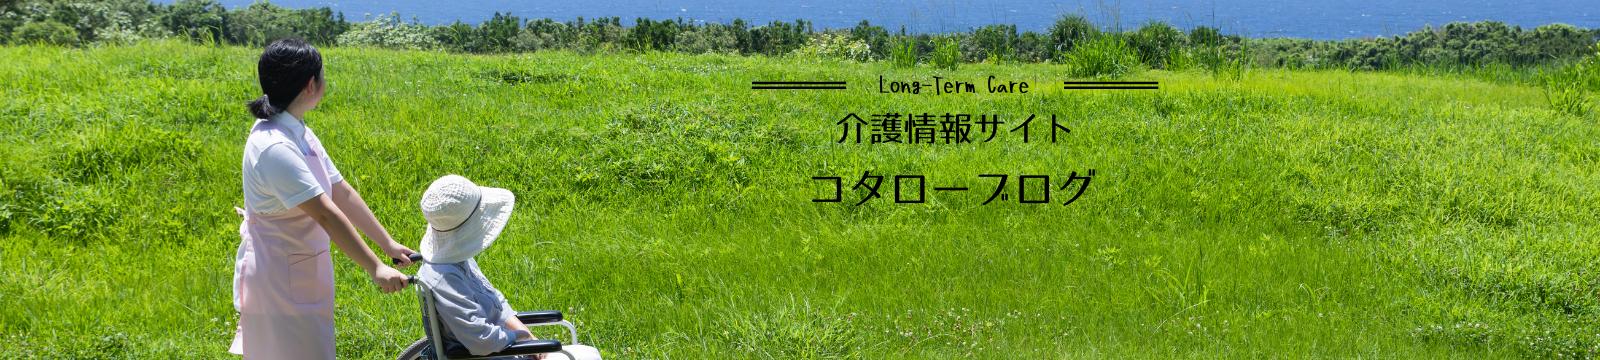 Long-Term Care-11